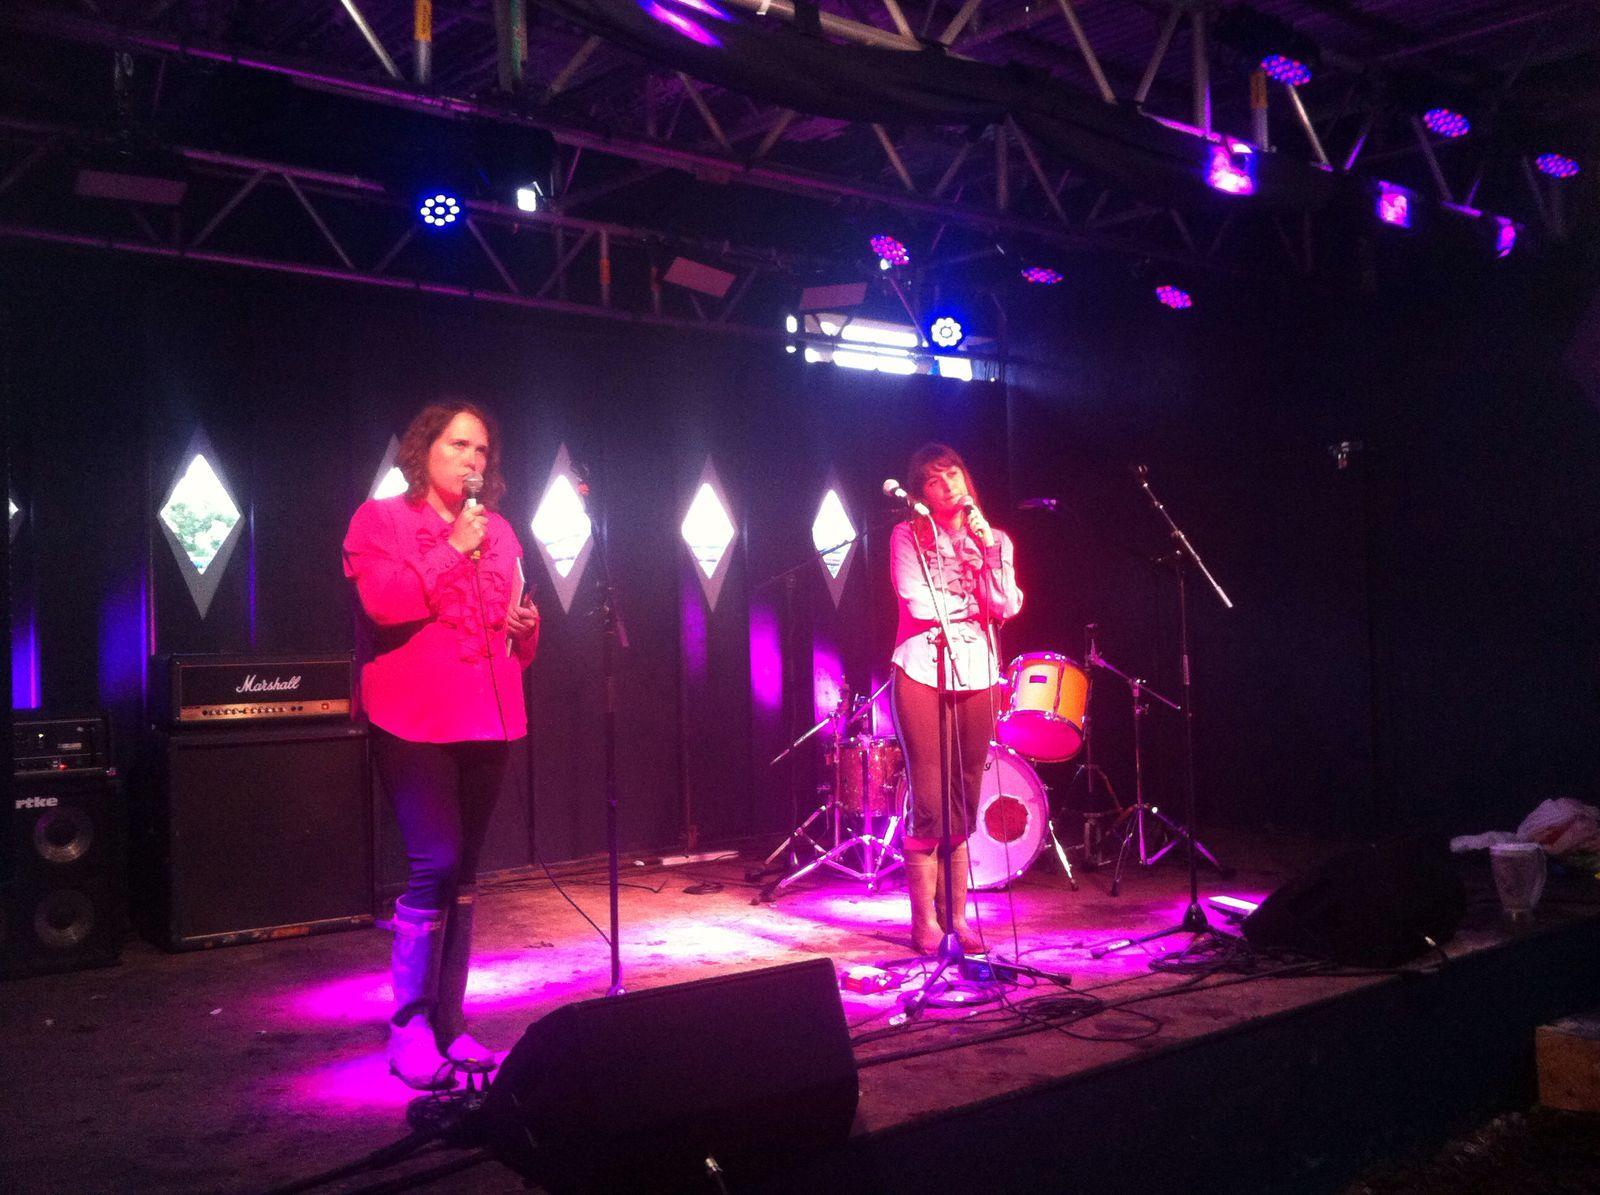 Performing at Glastonbury in wellies